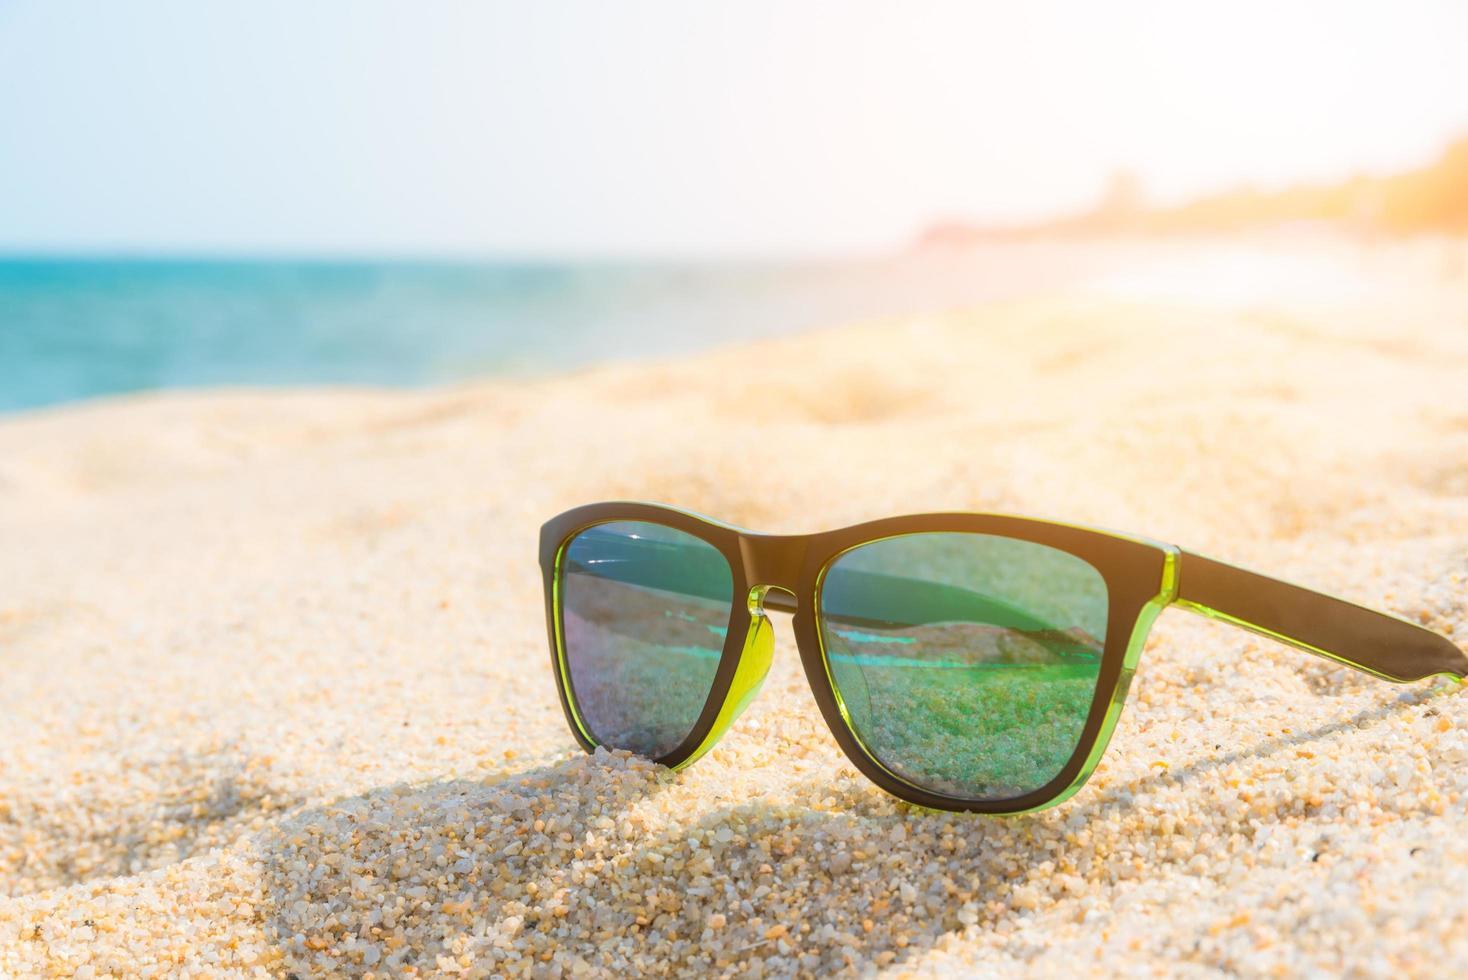 Sonnenbrille am Strand foto